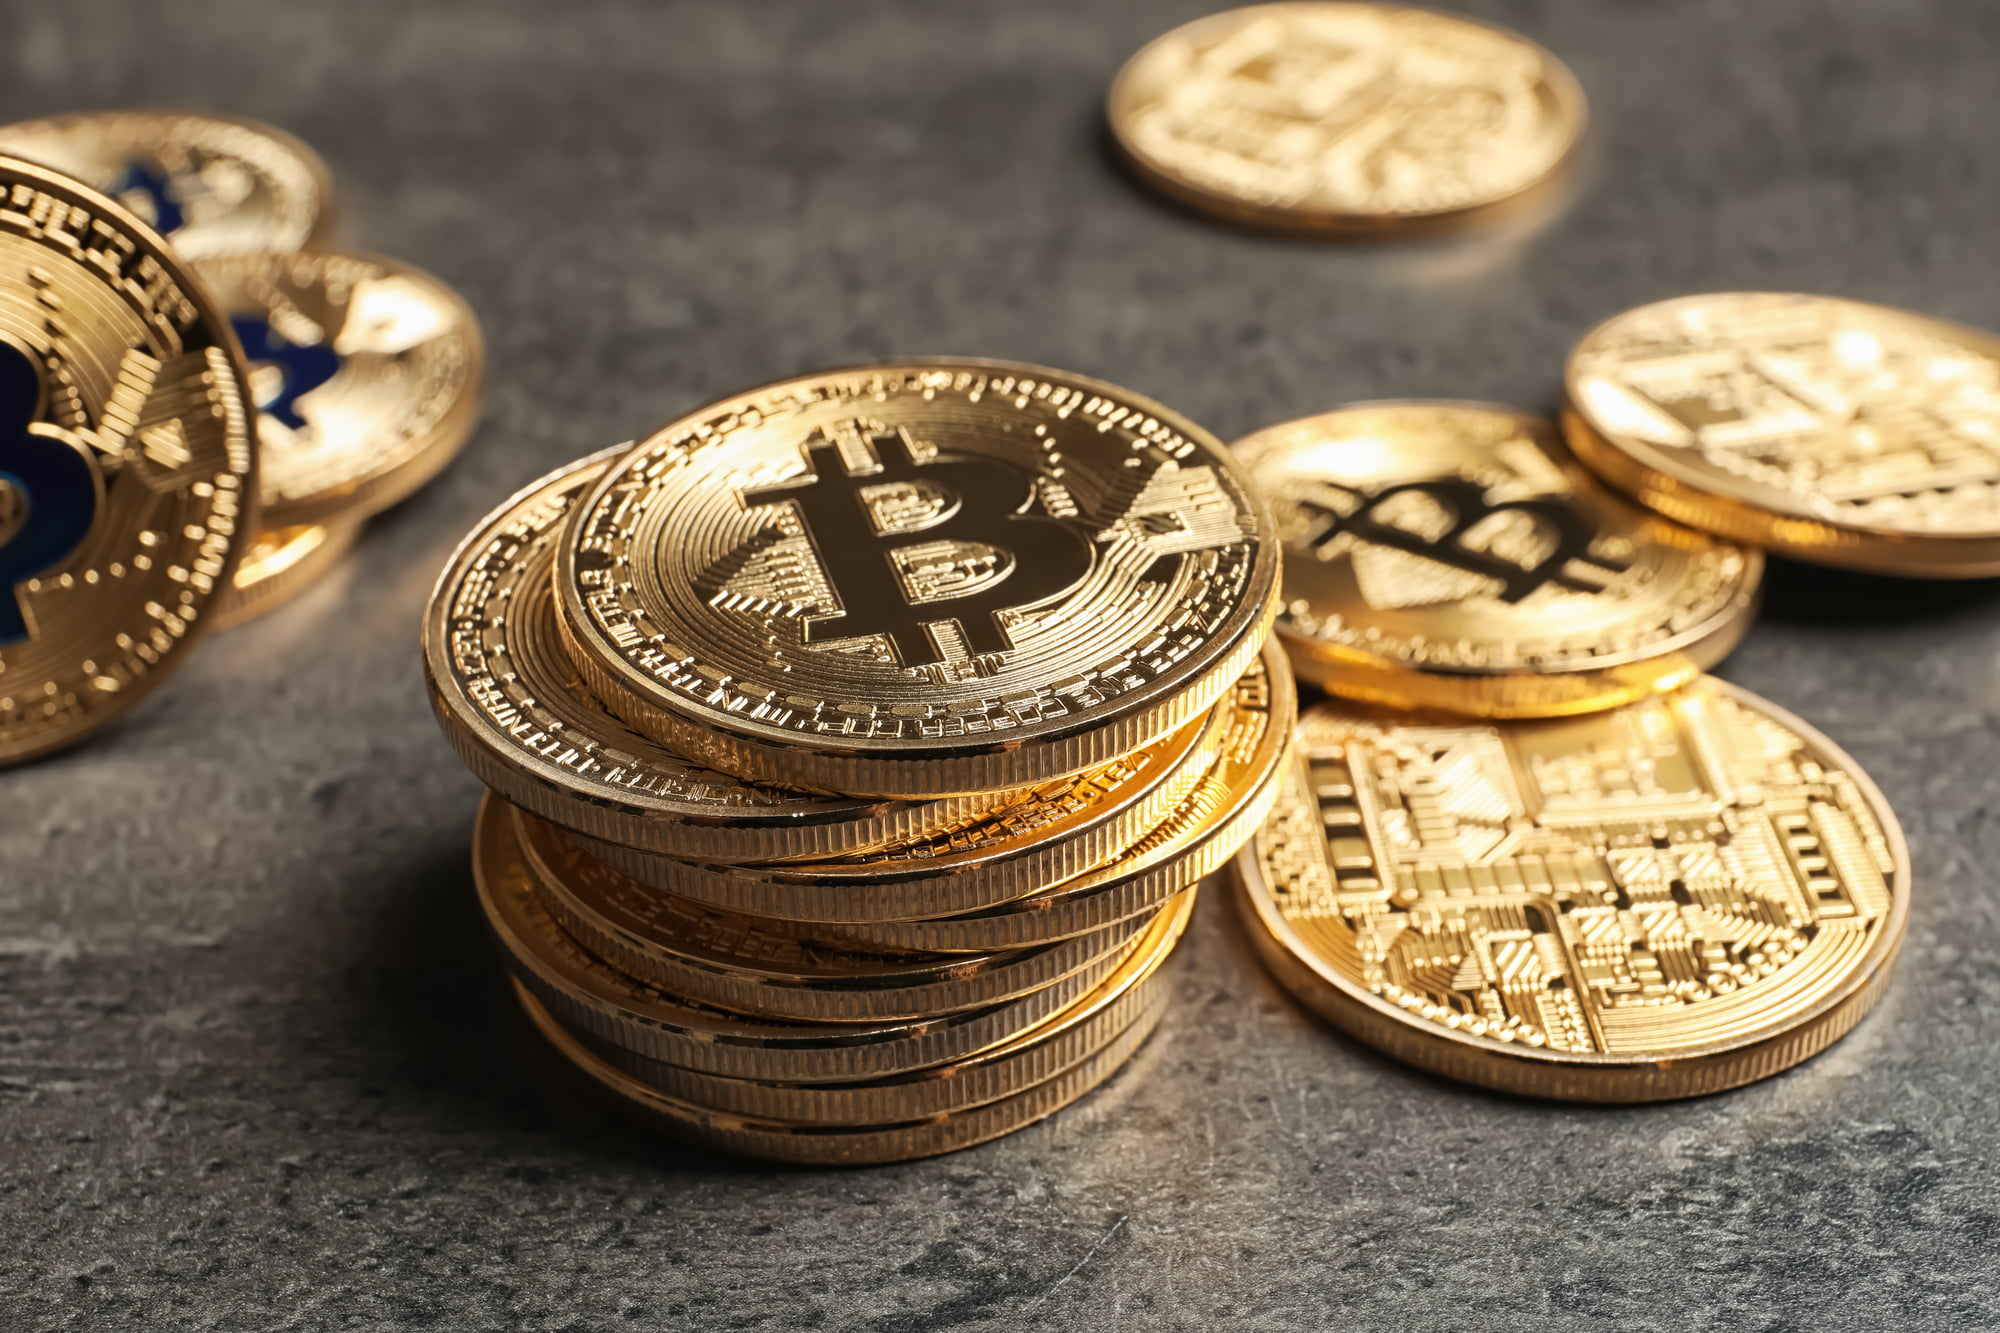 A 5% Move Pushes Bitcoin To A $1 Trillion Market Cap